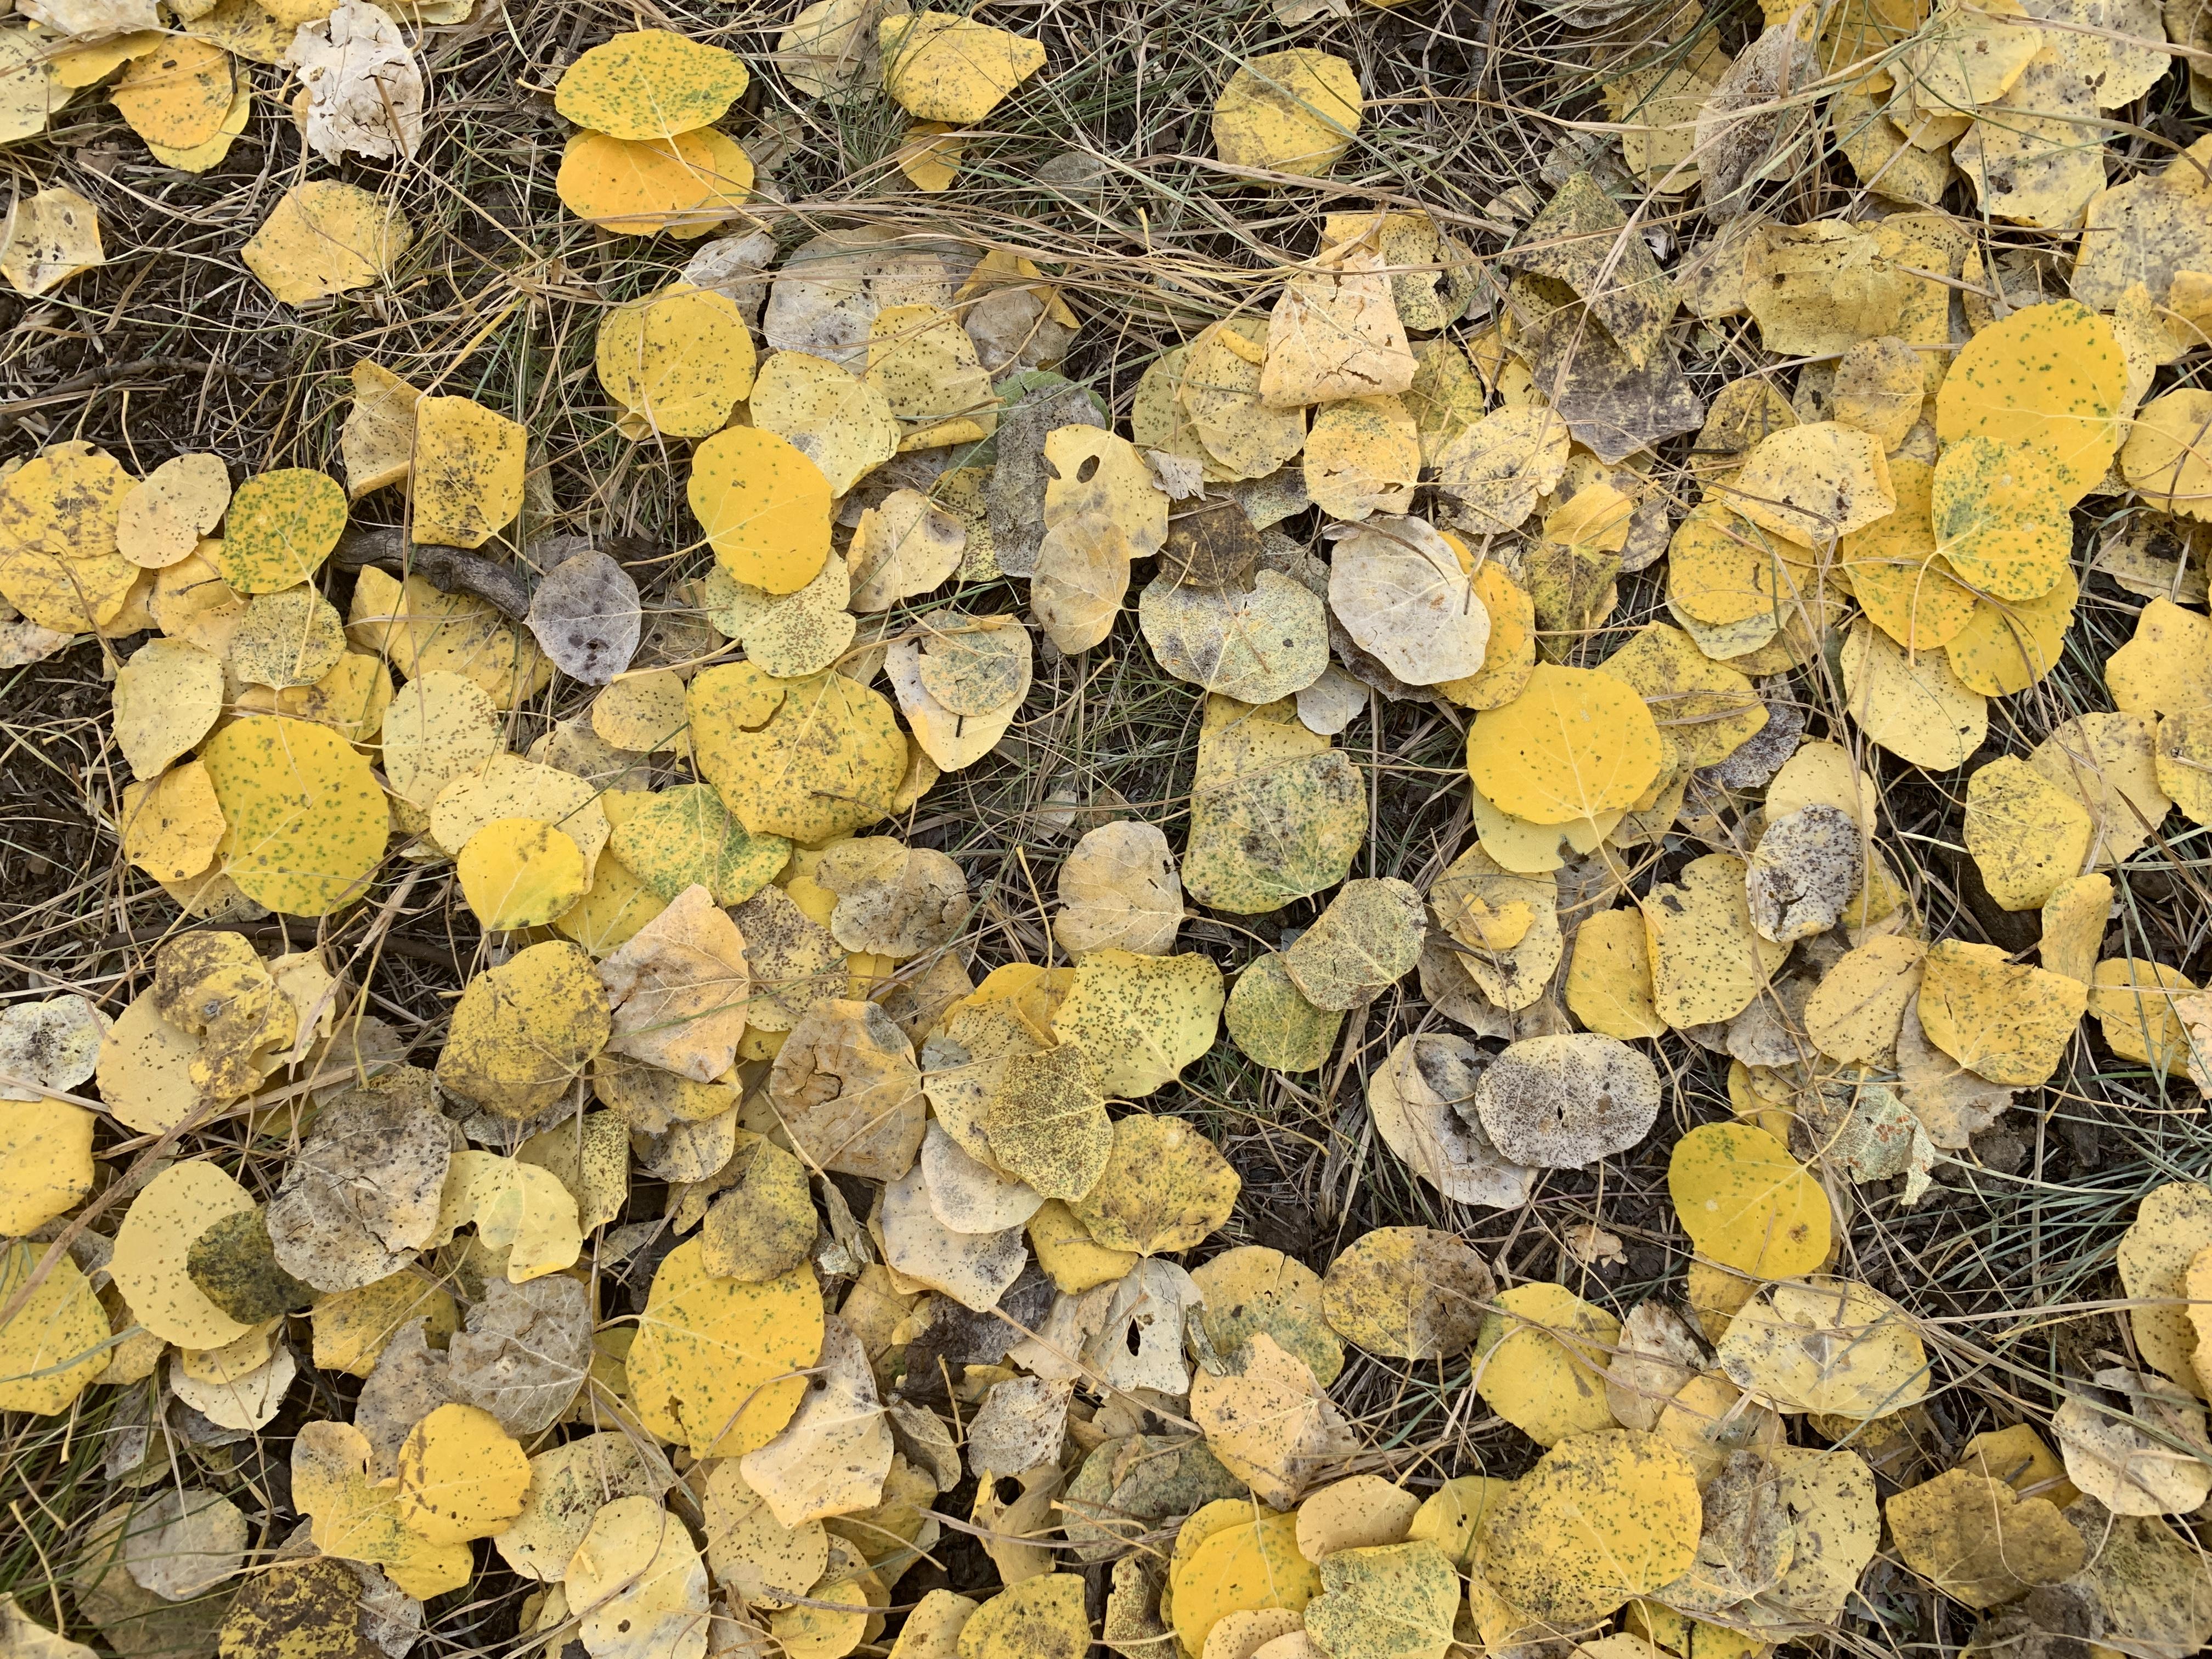 aspen leaves on the ground